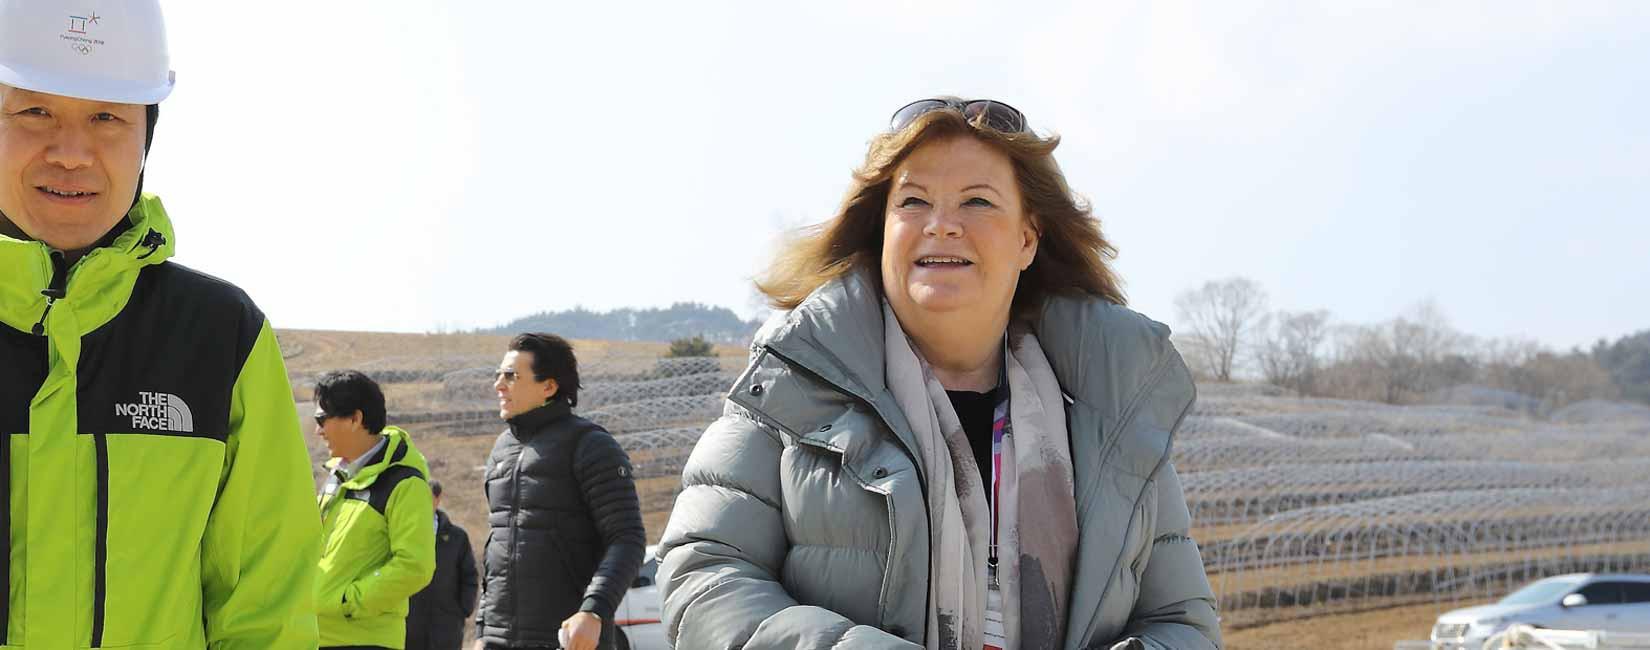 Gunilla Lindberg headed the IOC Coordination Commission for Pyeongchang 2018 ©SOK